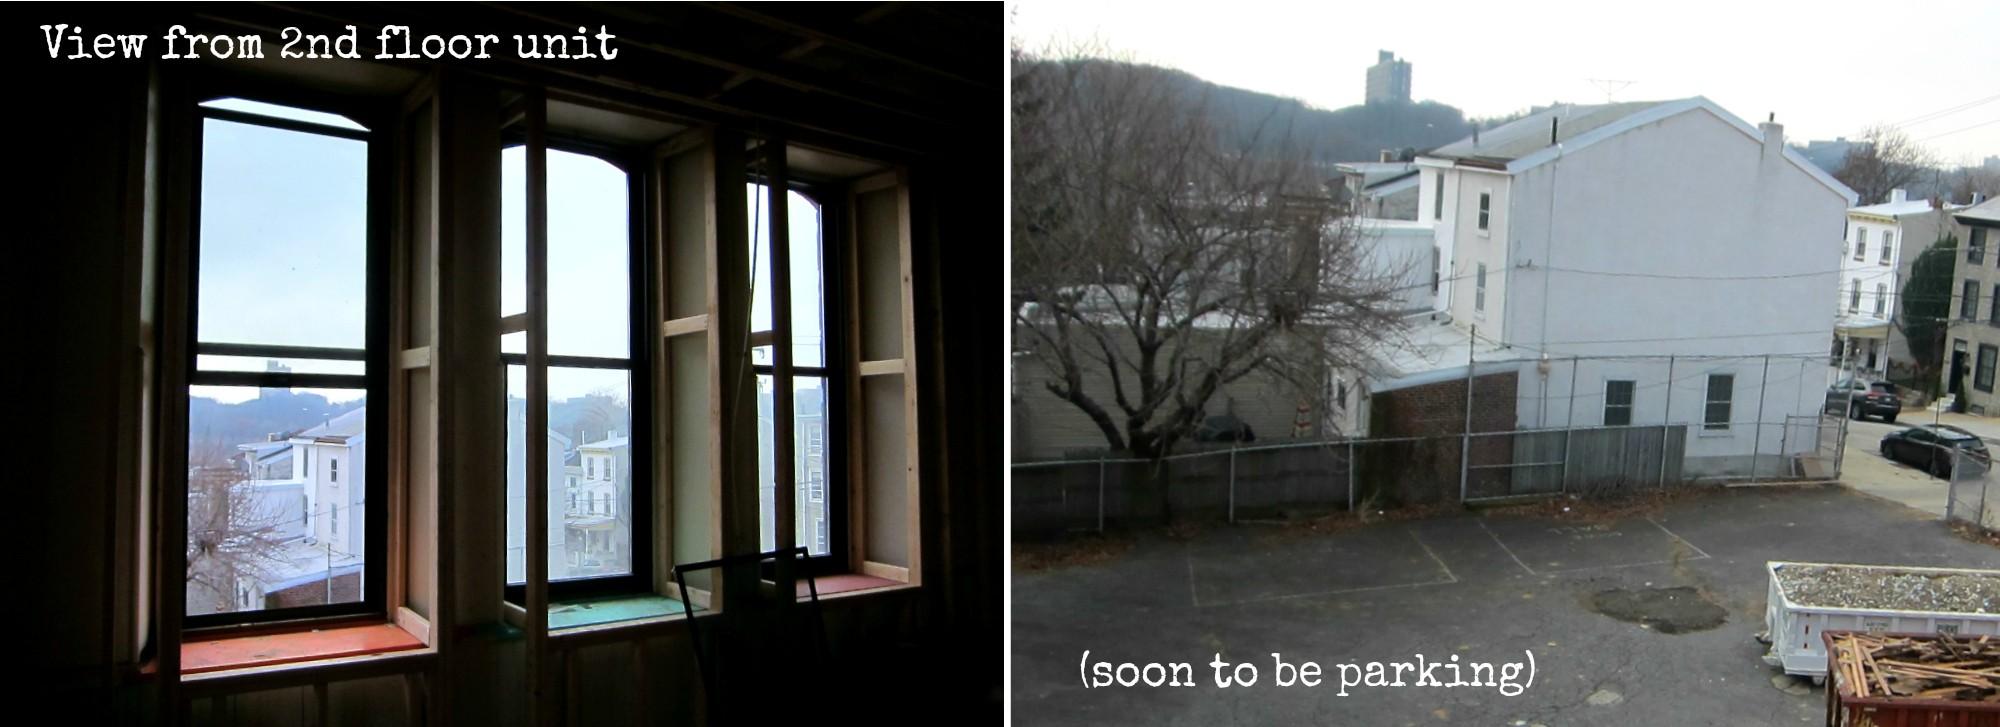 EastFallsLocal view apartment St Bridget school collage